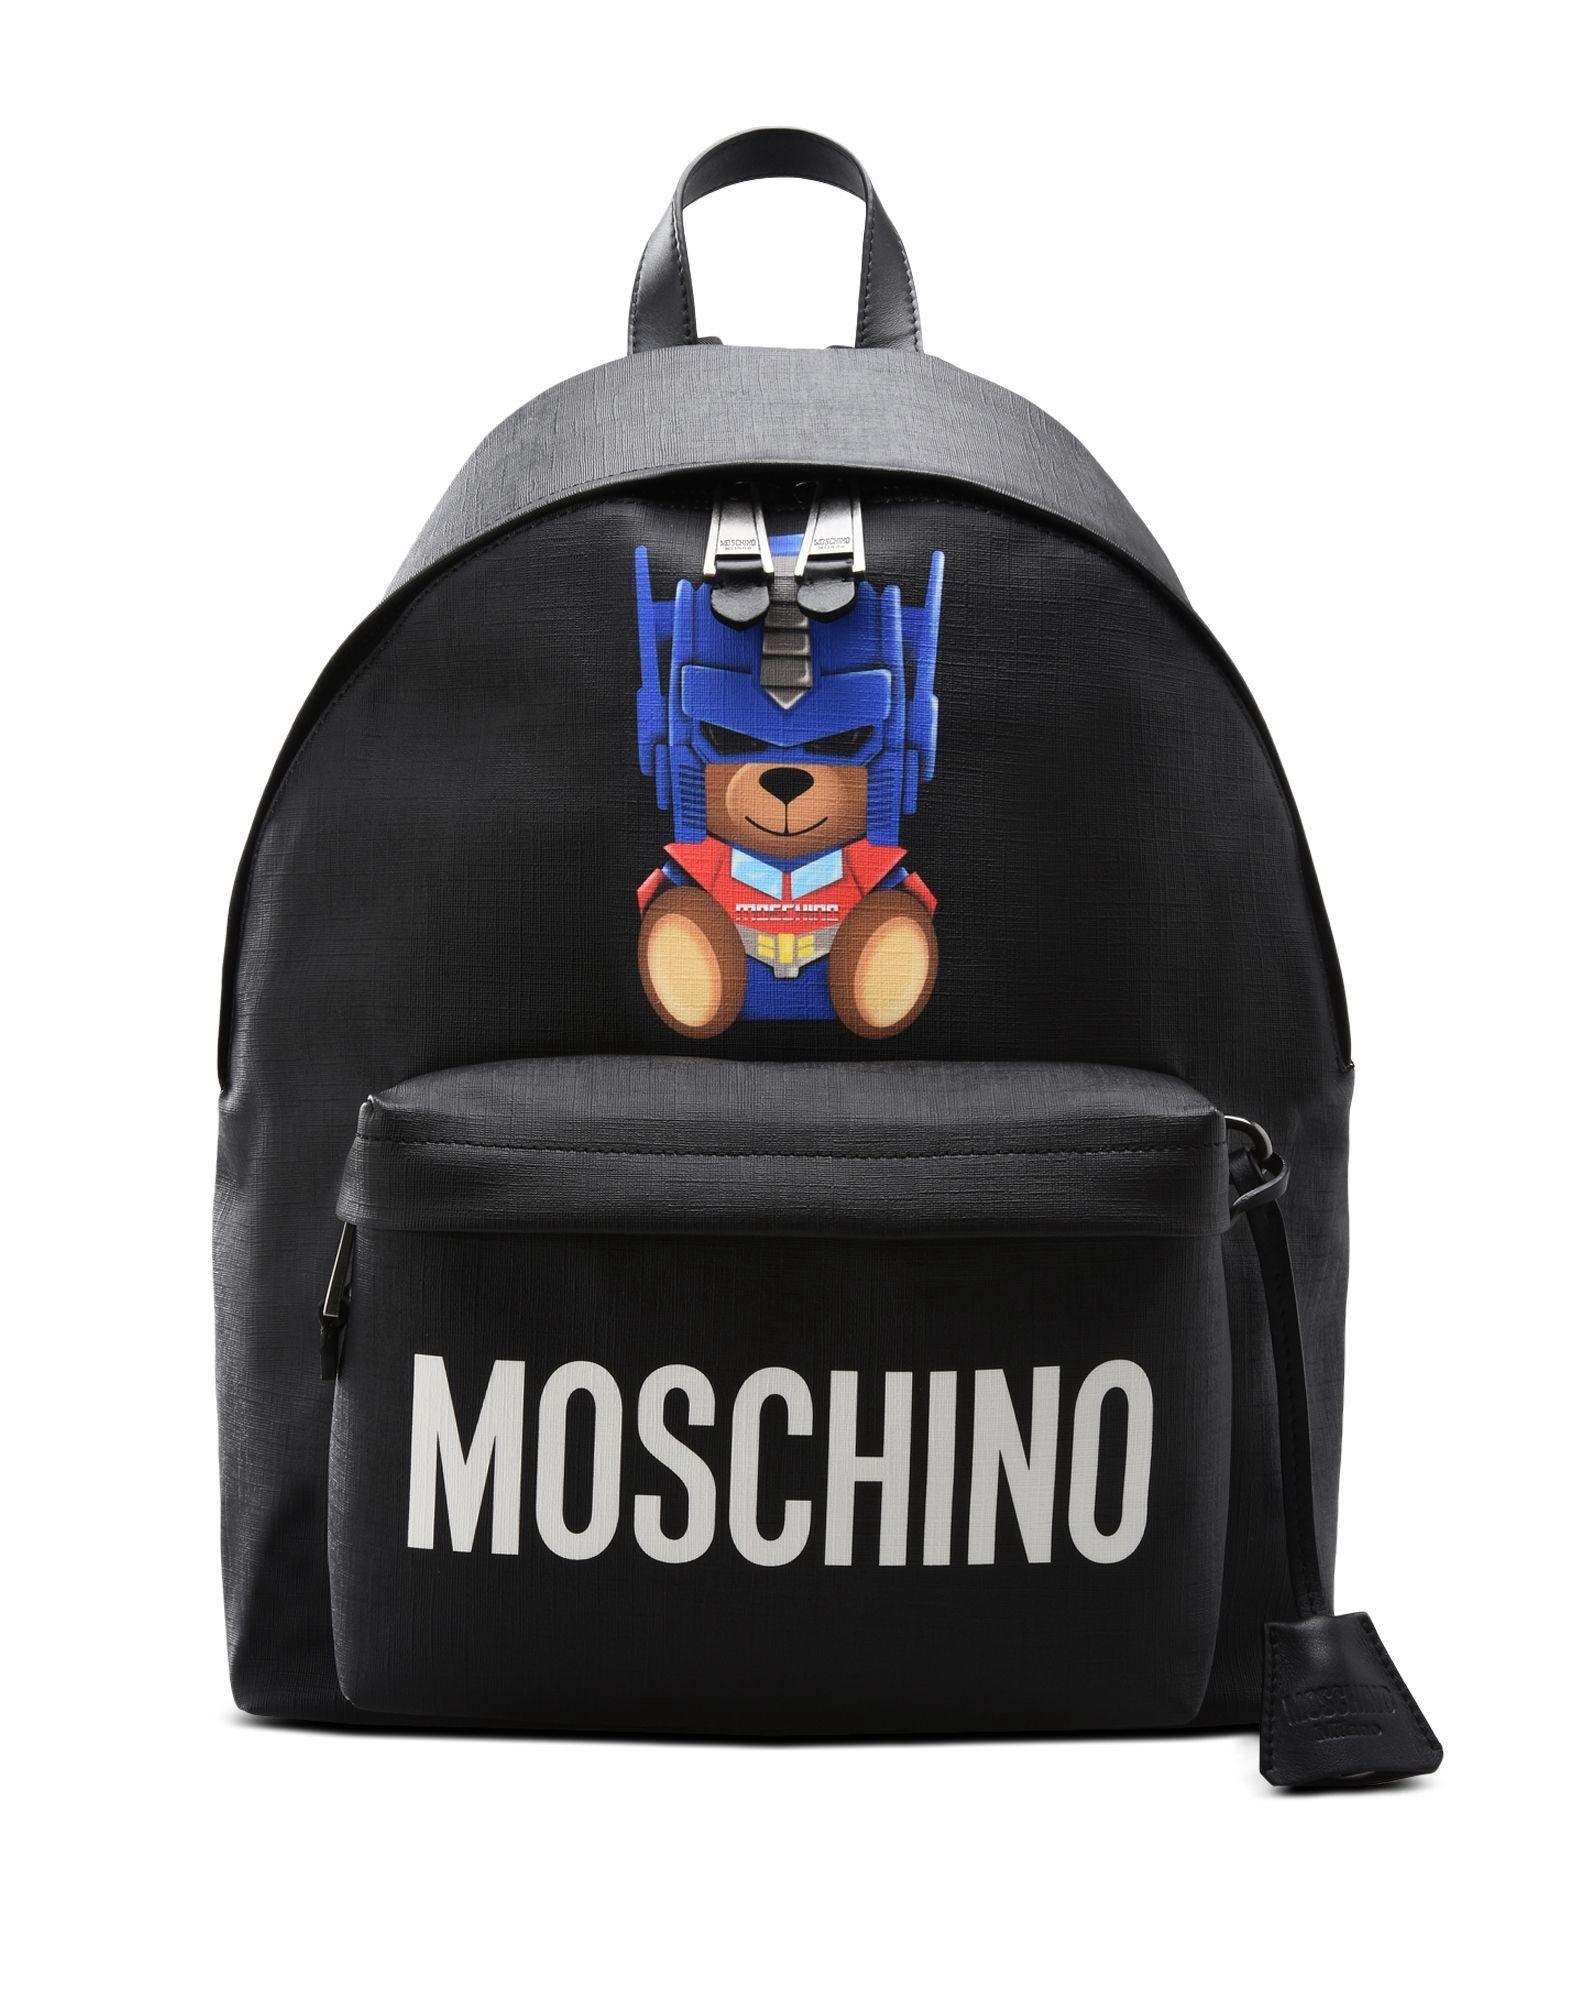 450c6a95a1 MOSCHINO Moschino Backpack. #moschino #bags #backpacks # | Moschino ...